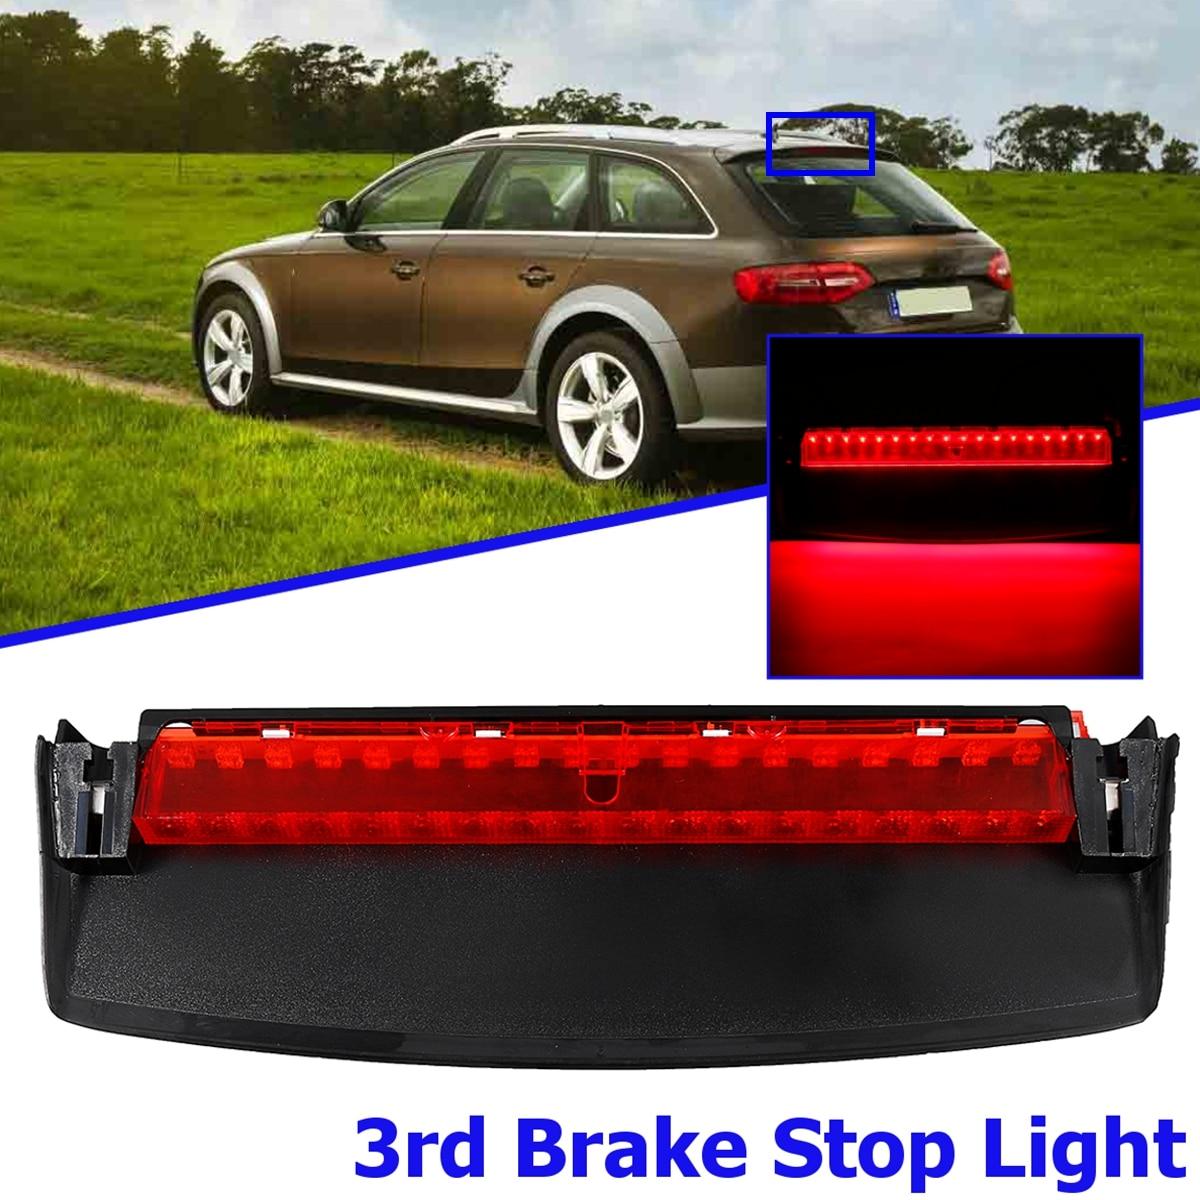 Rear LED Third High Brake Mount Stop Lamp Light For Audi